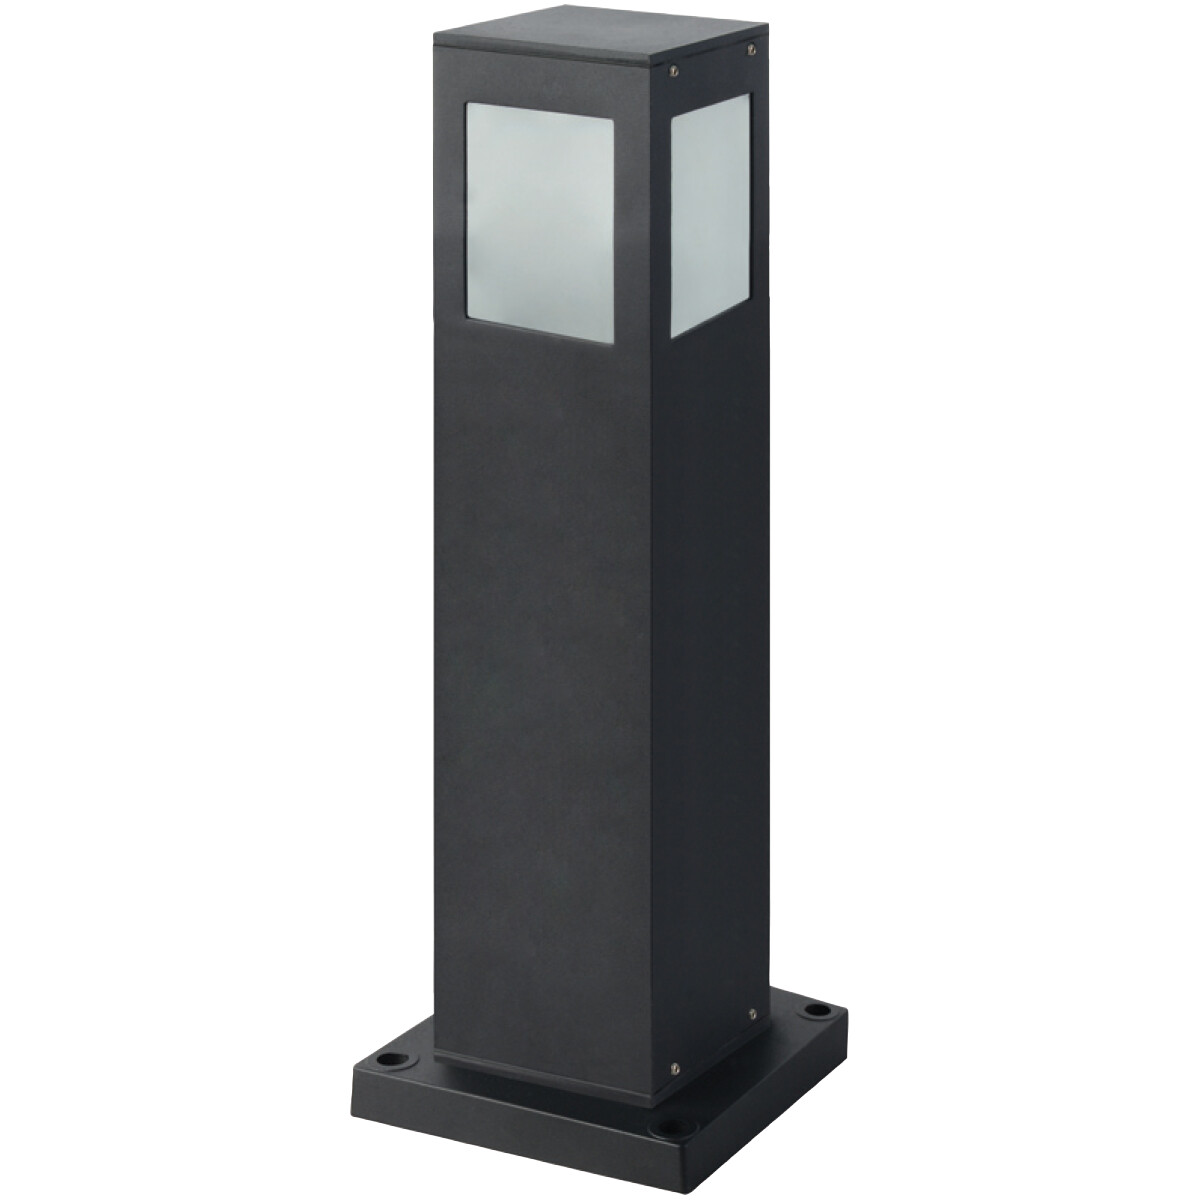 LED Tuinverlichting - Buitenlamp - Kavy 4 - Staand - Aluminium Mat Zwart - E27 - Vierkant